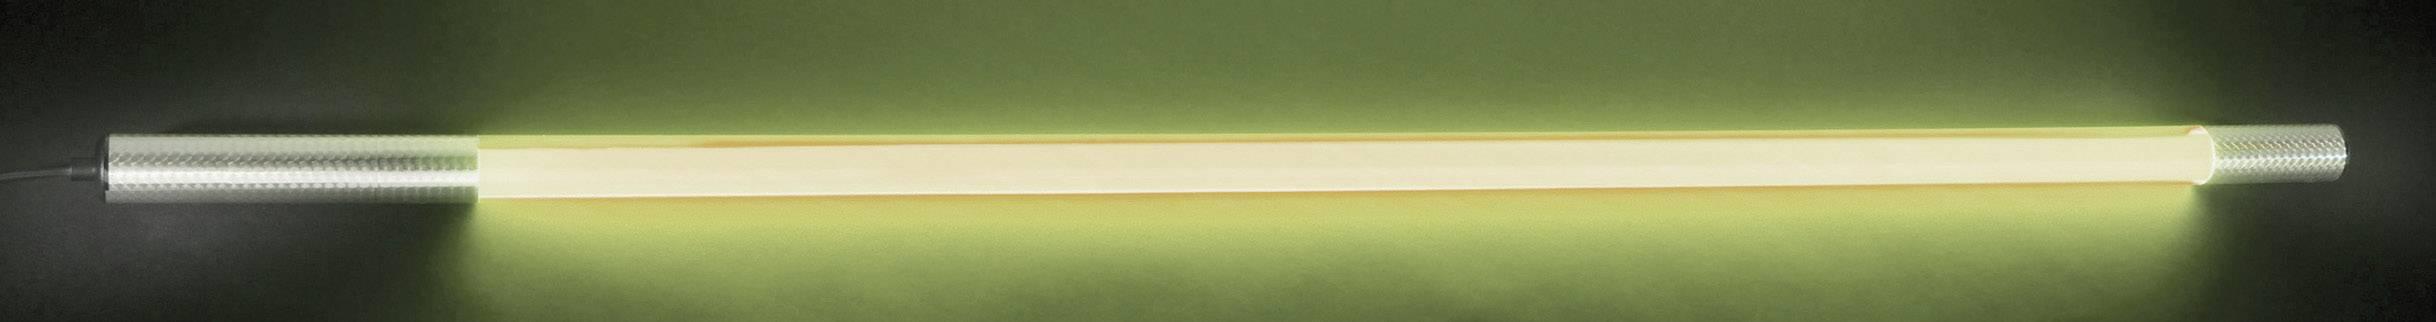 Žiarivka L, 134 cm, 36 W, žltá, 1 ks